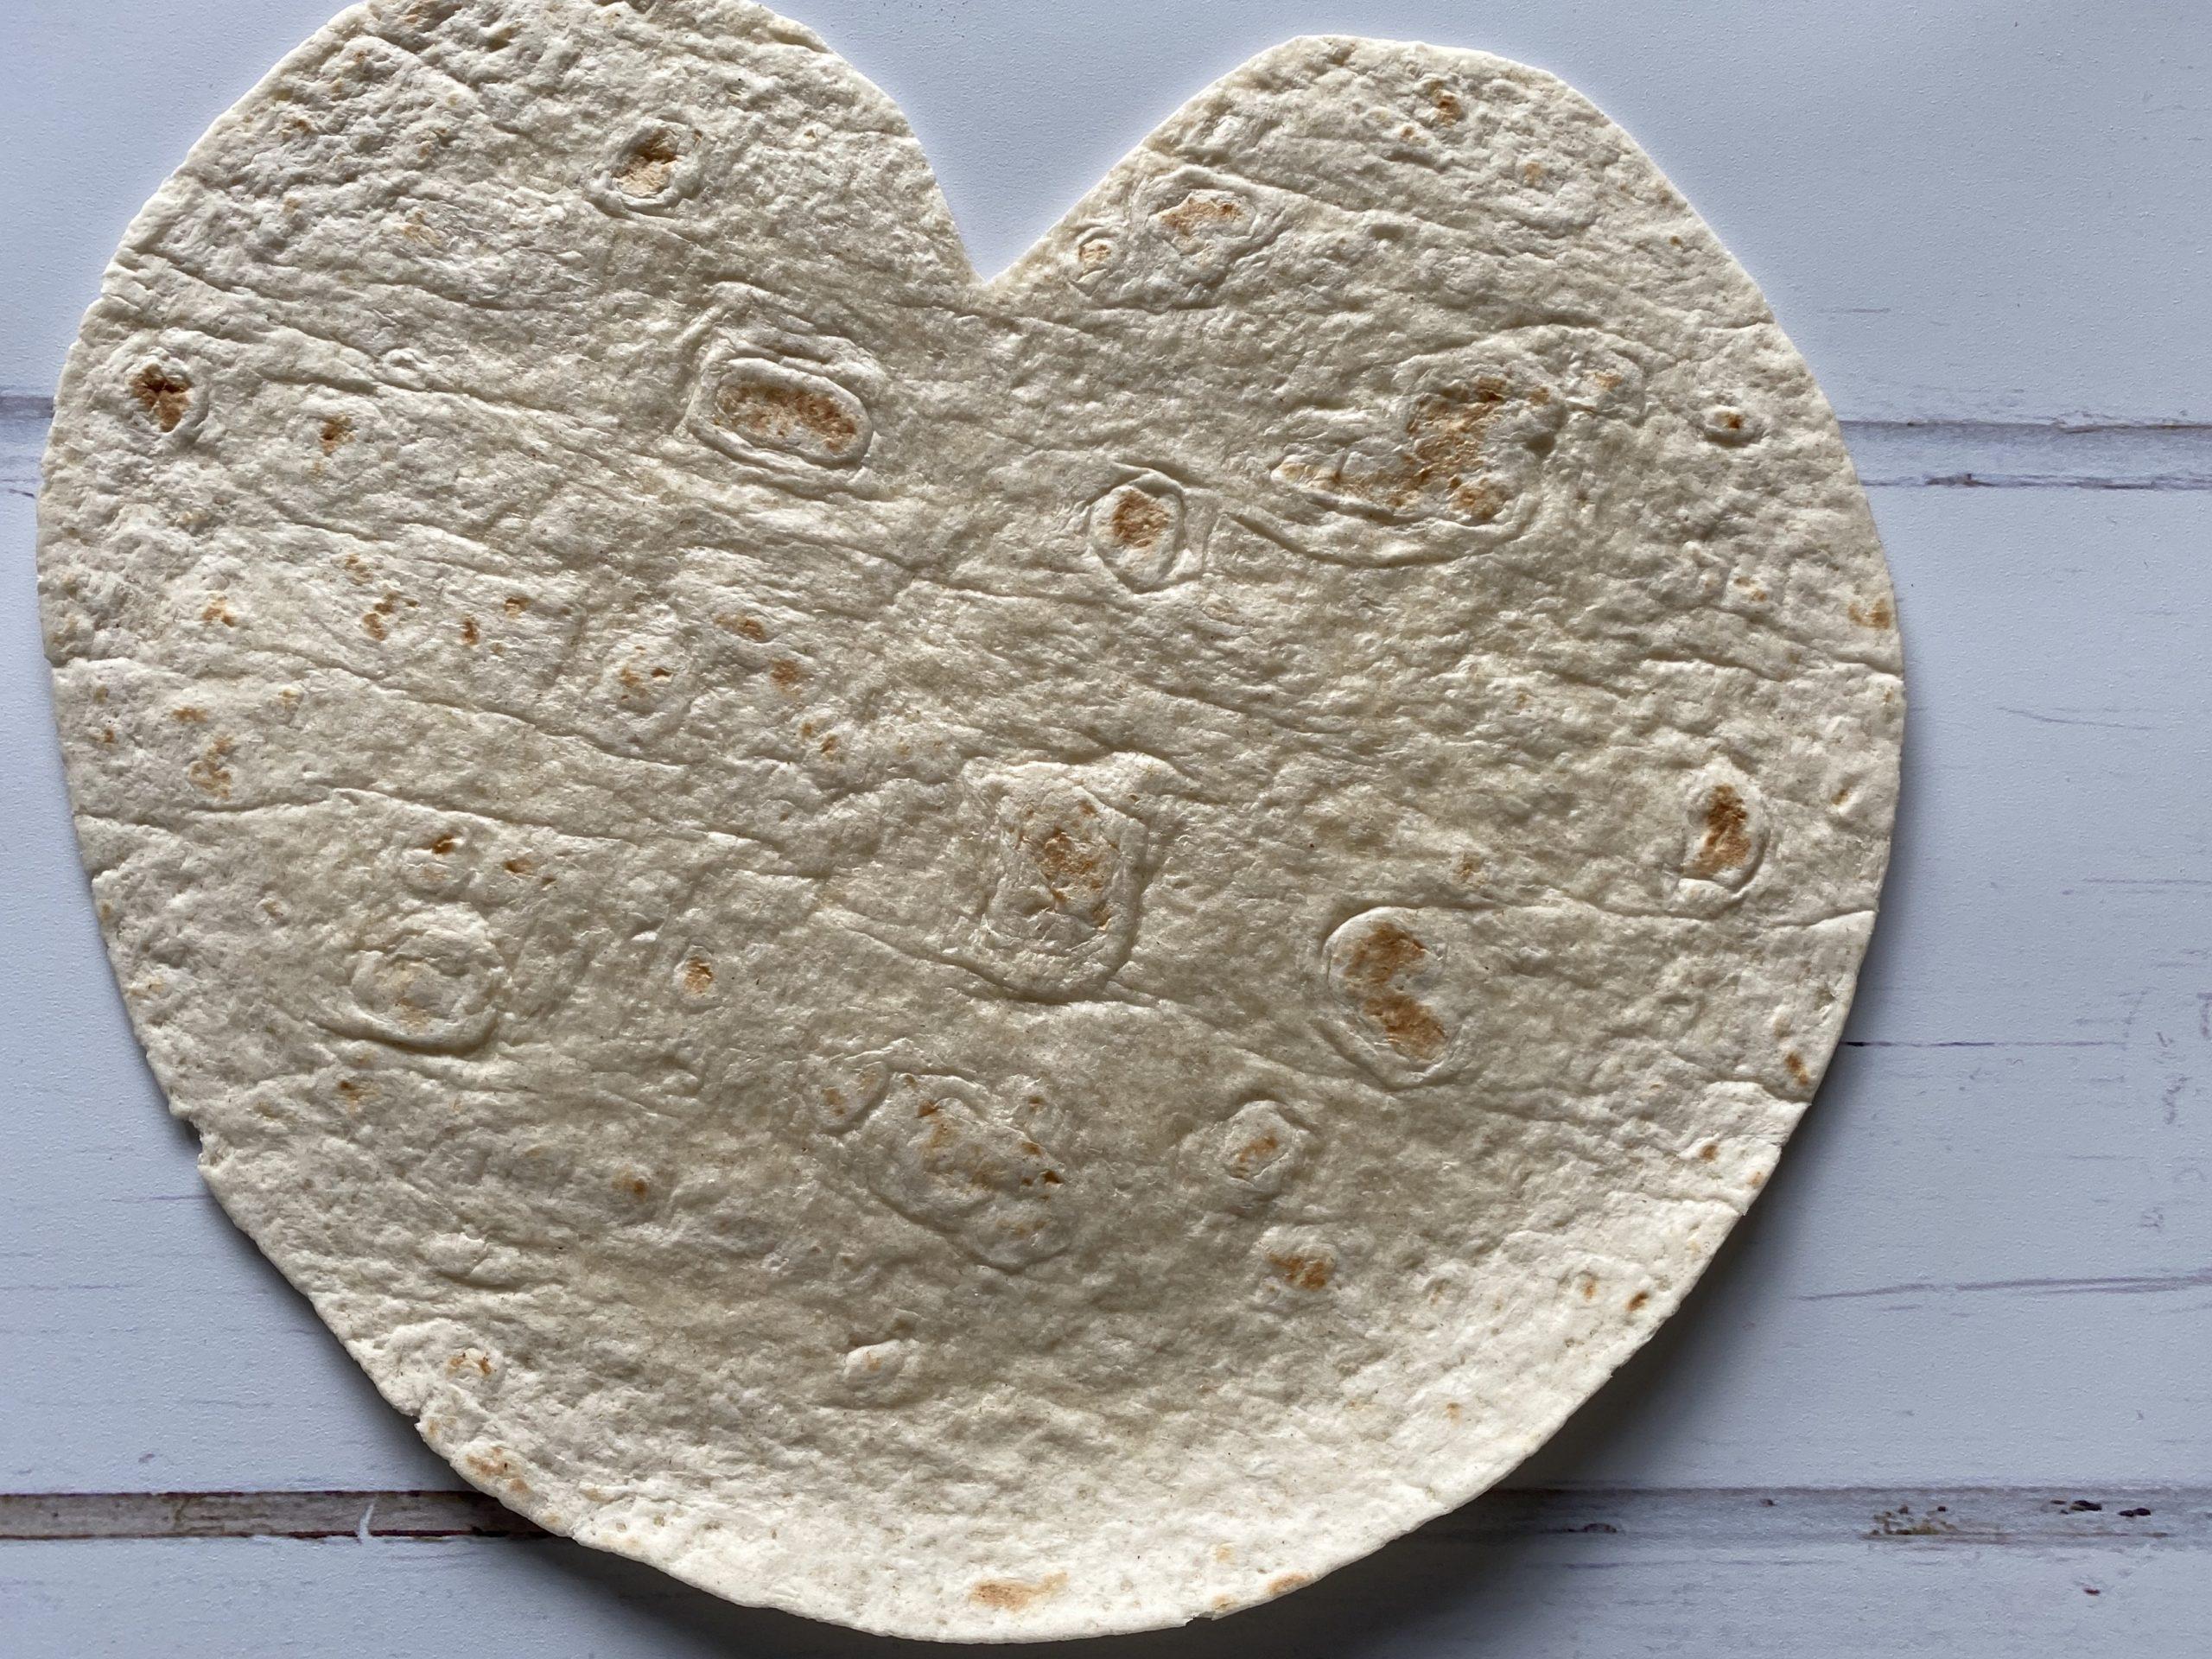 heart shaped tortilla wrap